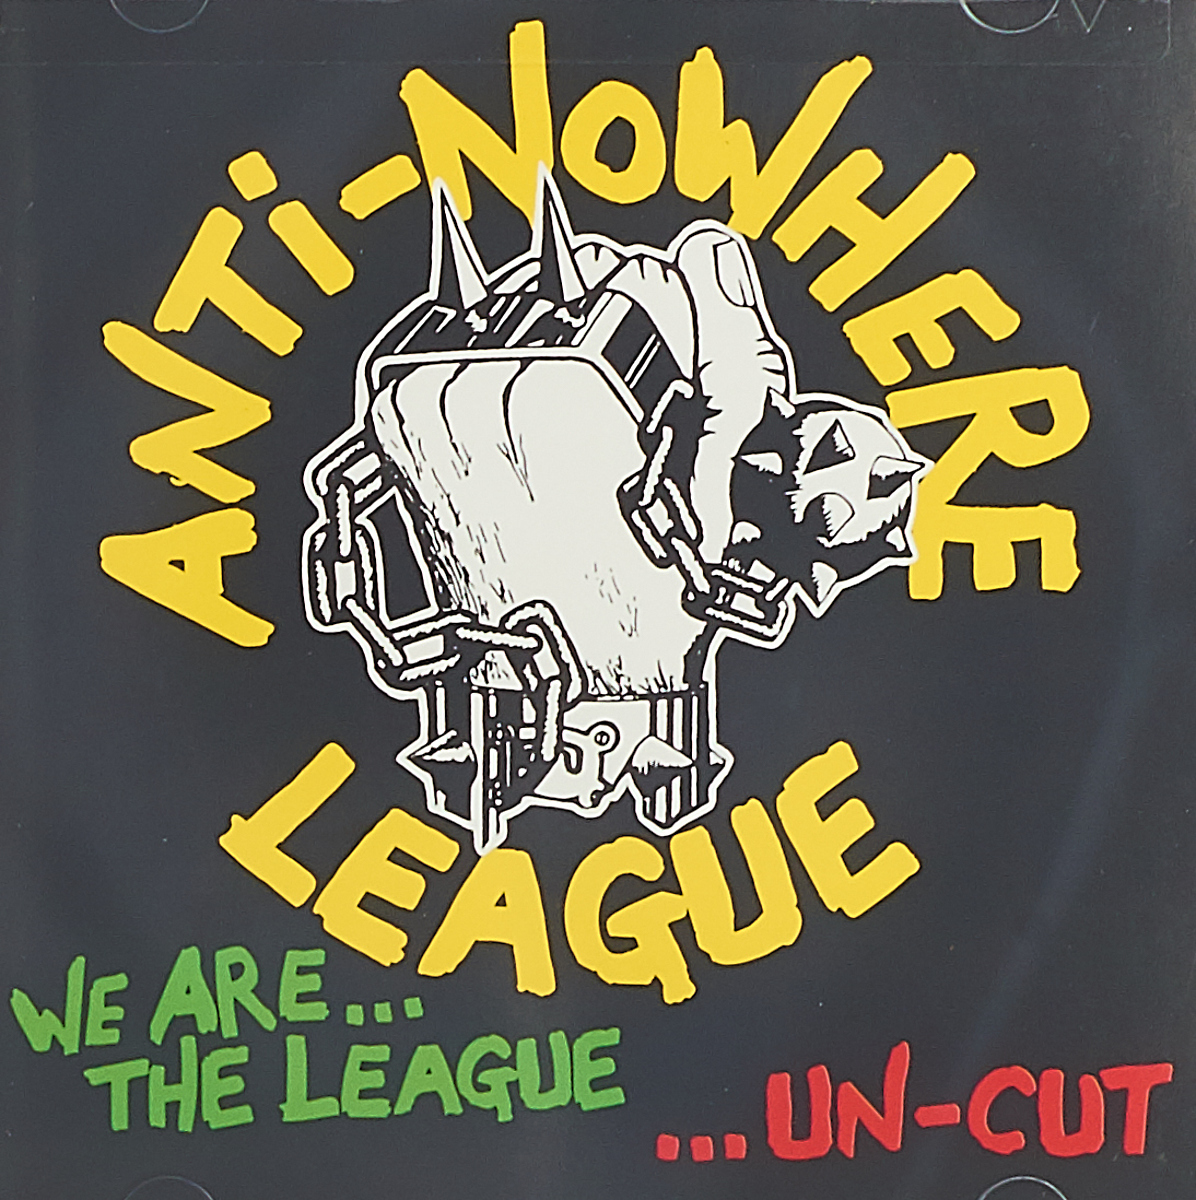 Anti Nowhere League Anti-Nowhere League. We Are... The League...Un-cut the human league manchester